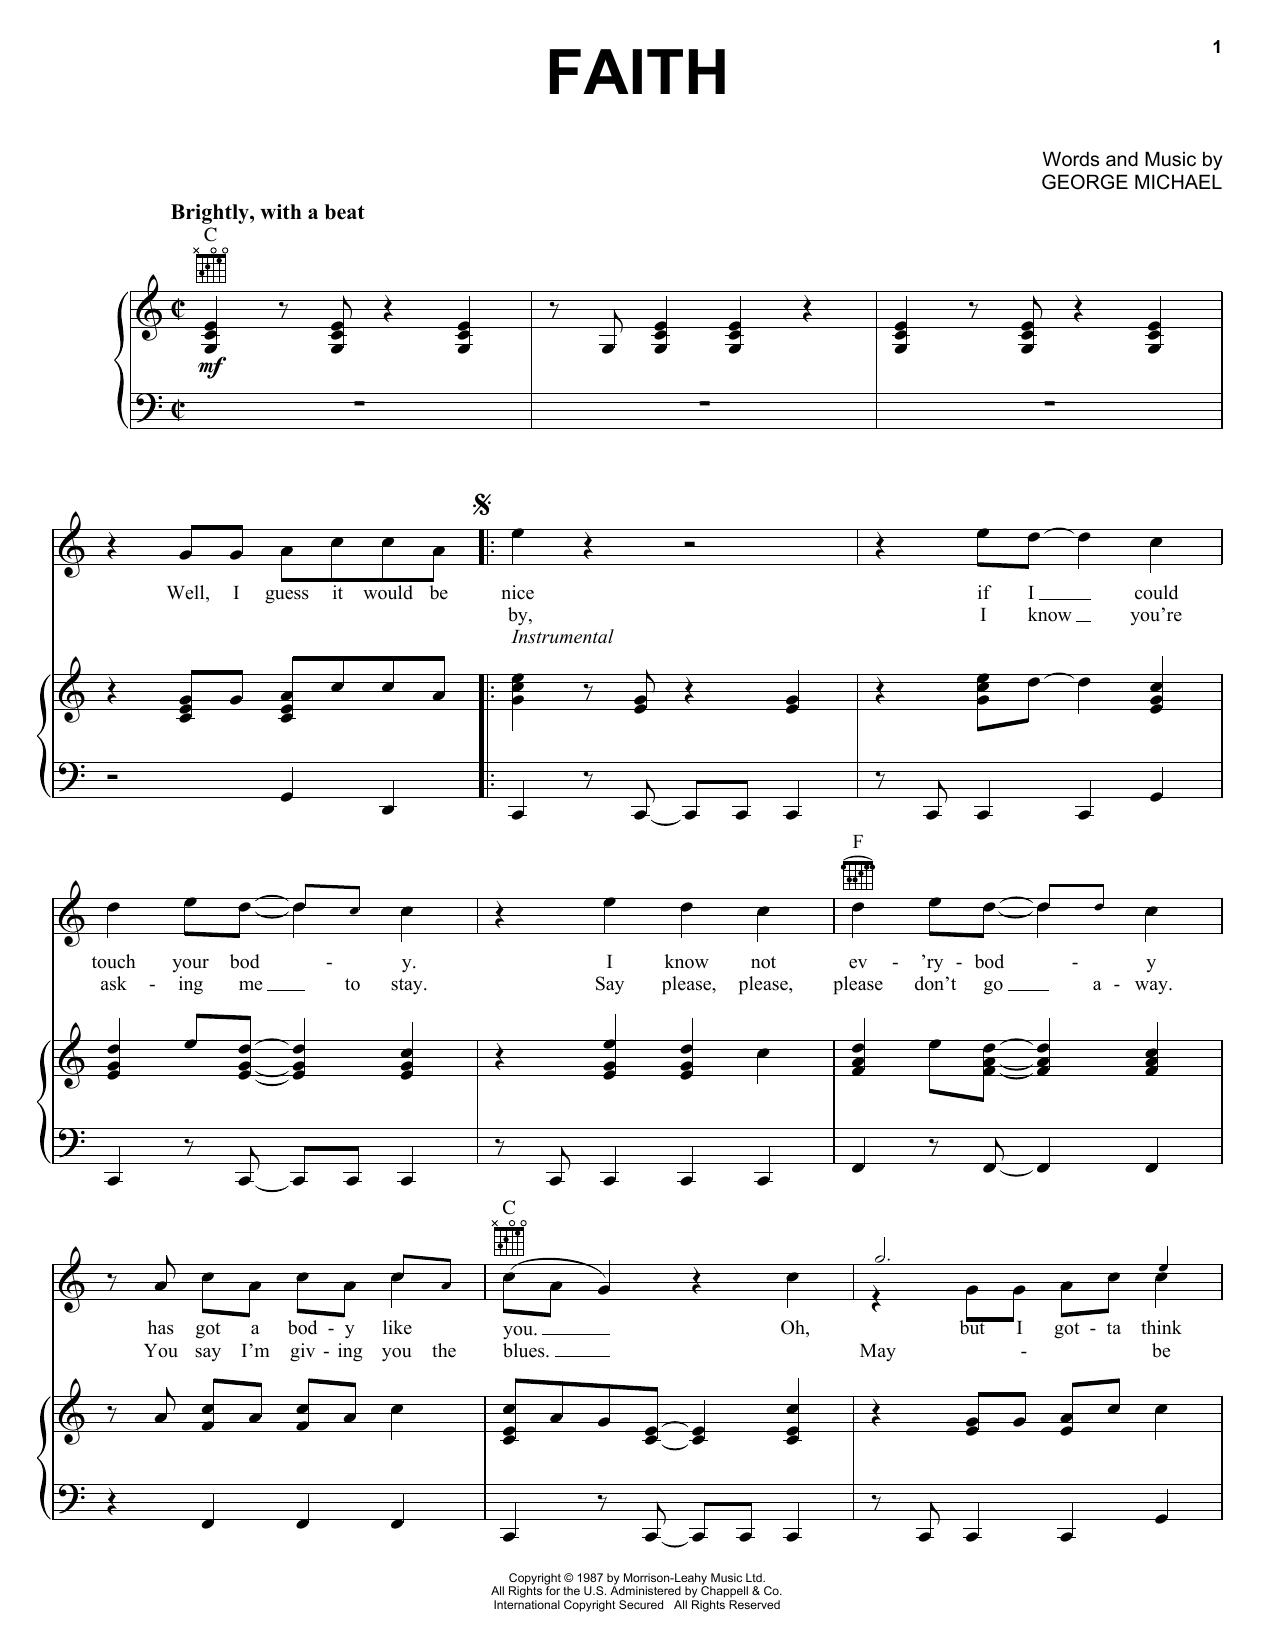 Sheet Music Digital Files To Print Licensed George Michael Digital